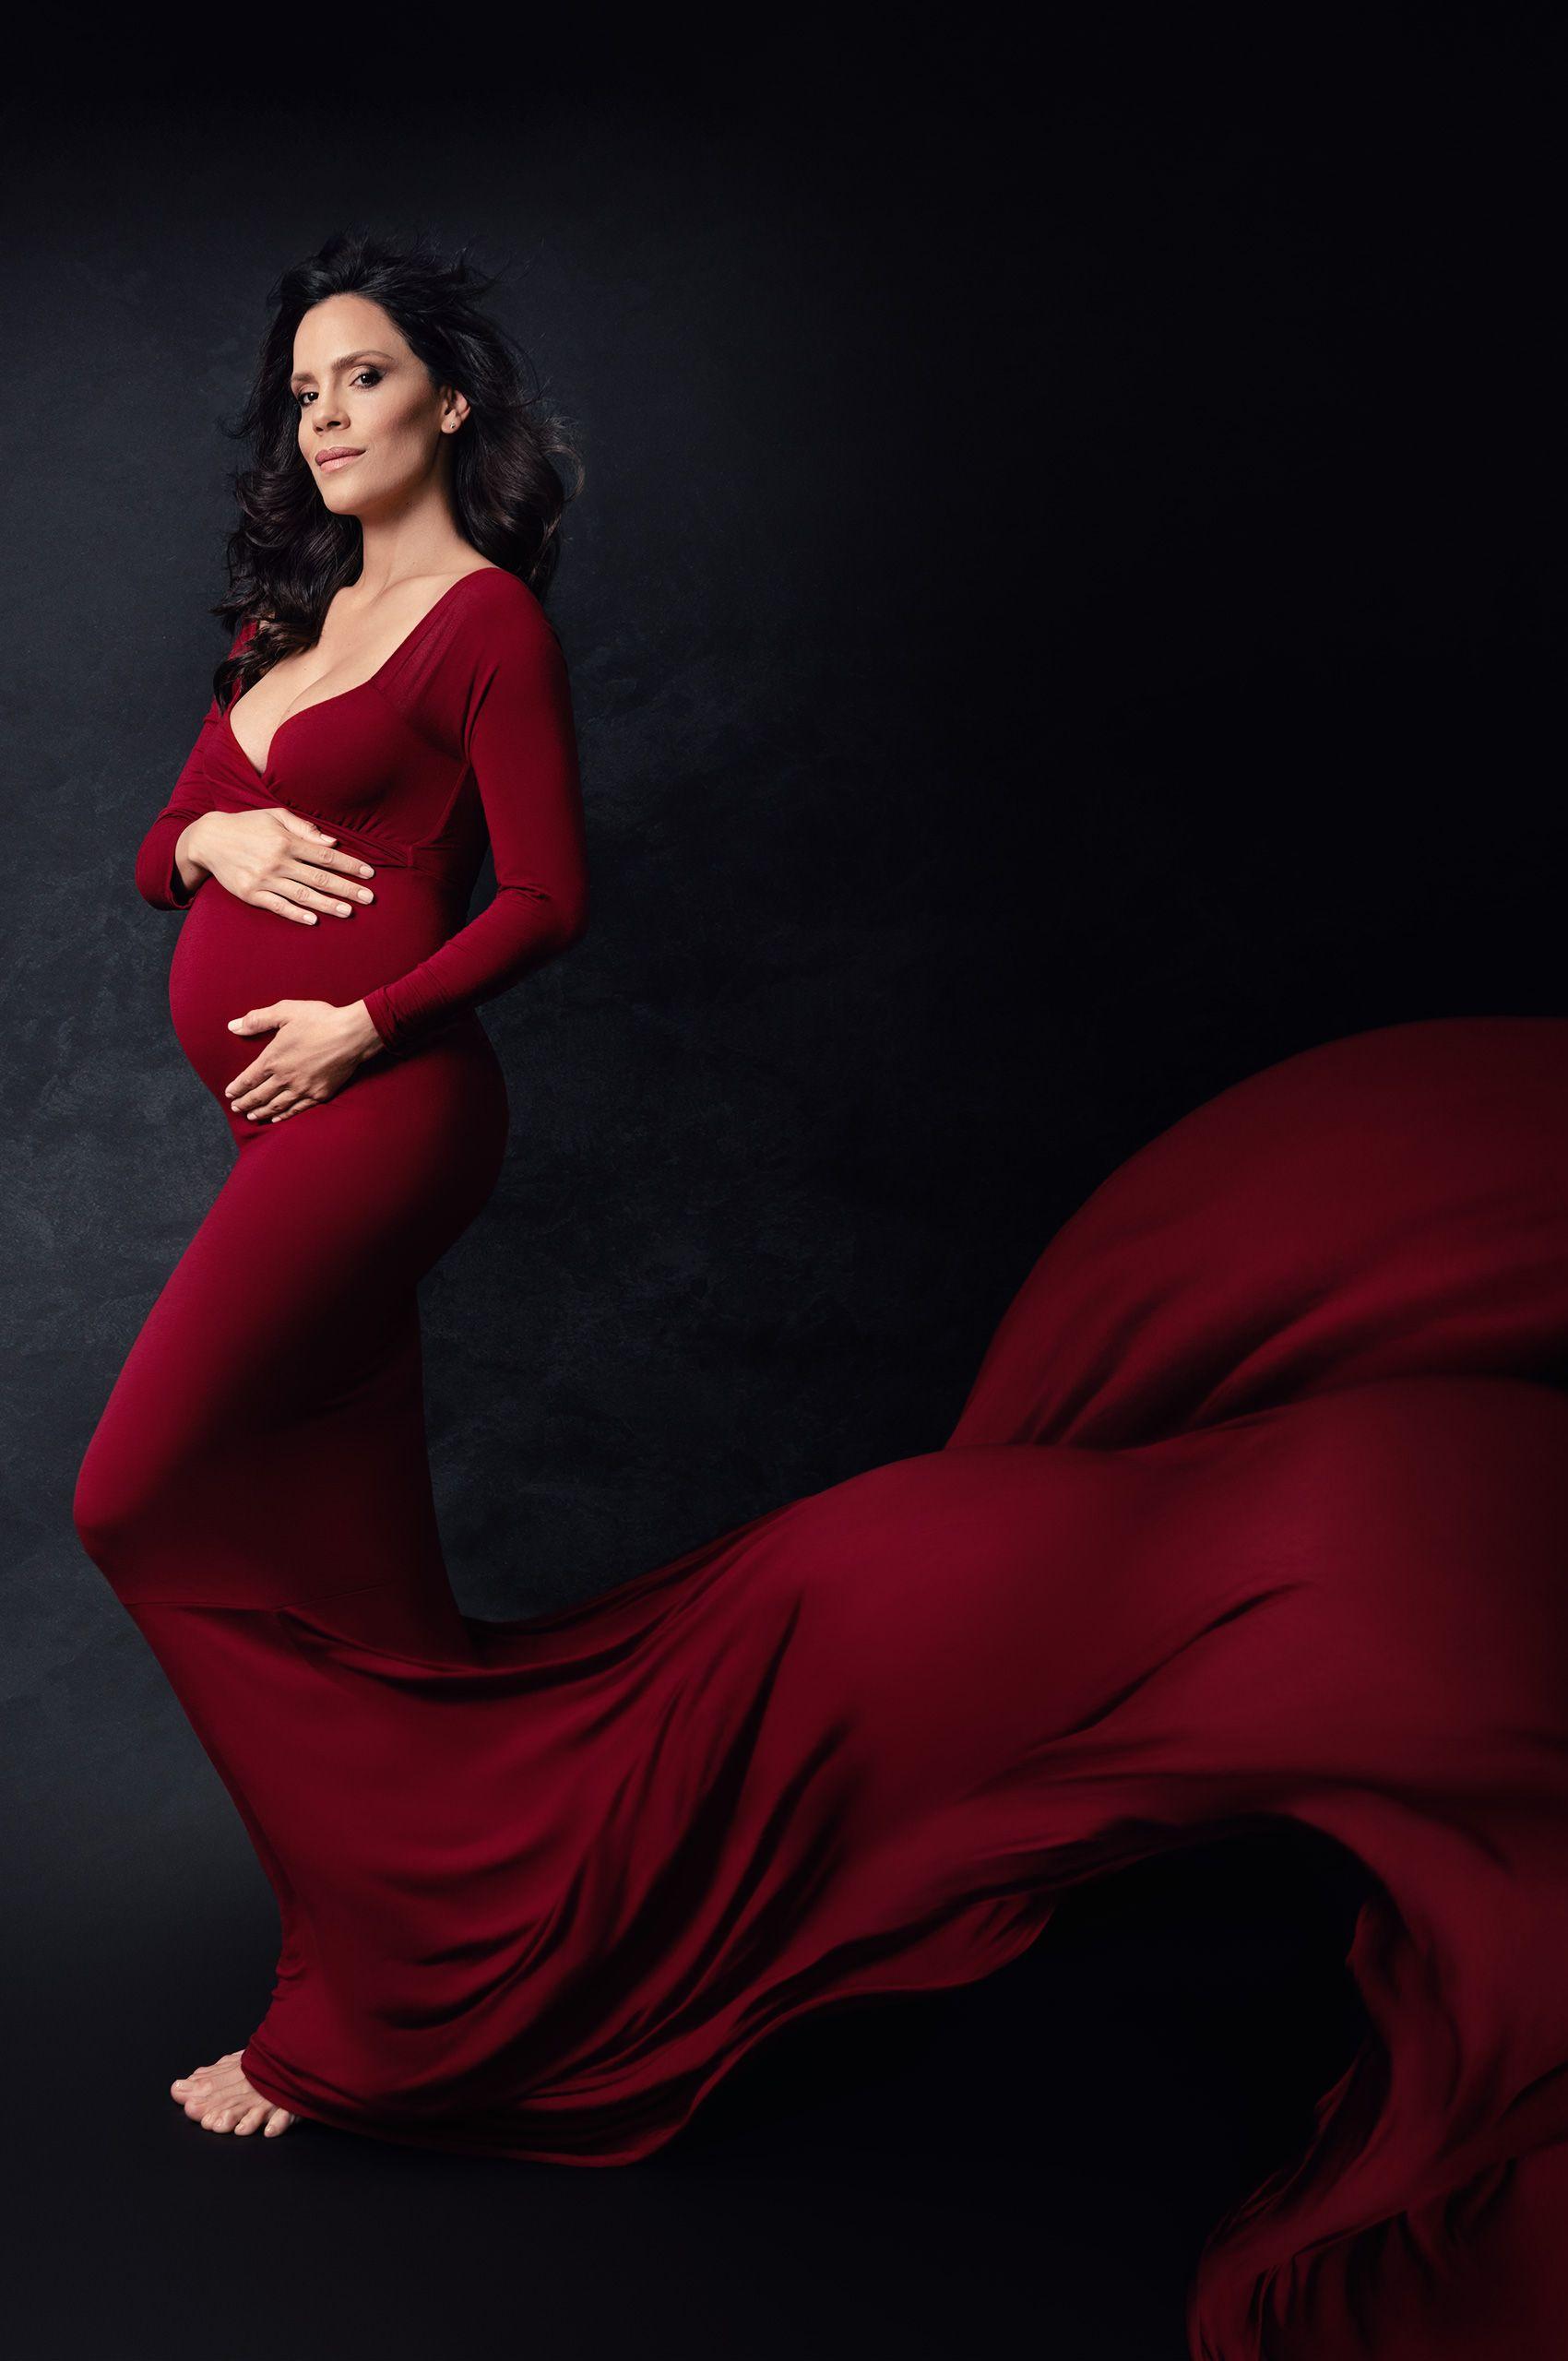 Lizet-Pregnancy-Shoot2613_fix.jpg